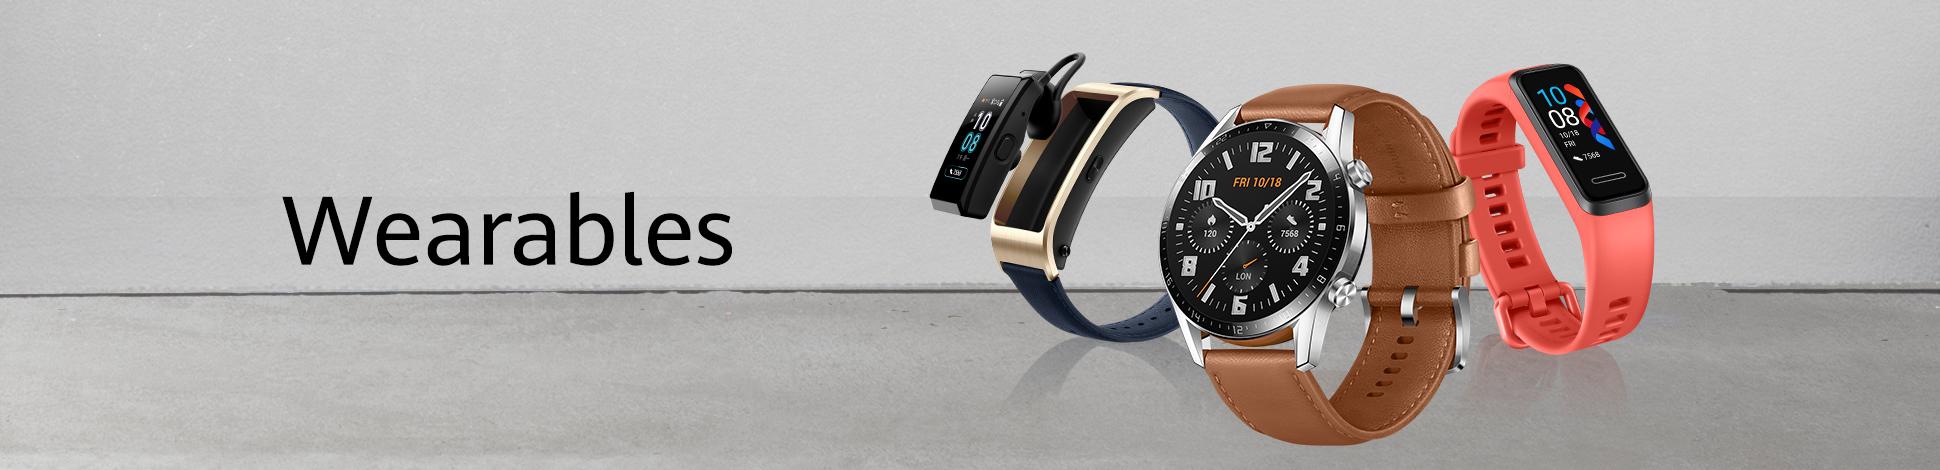 1940x470-wearables.jpg | Juntoz.com